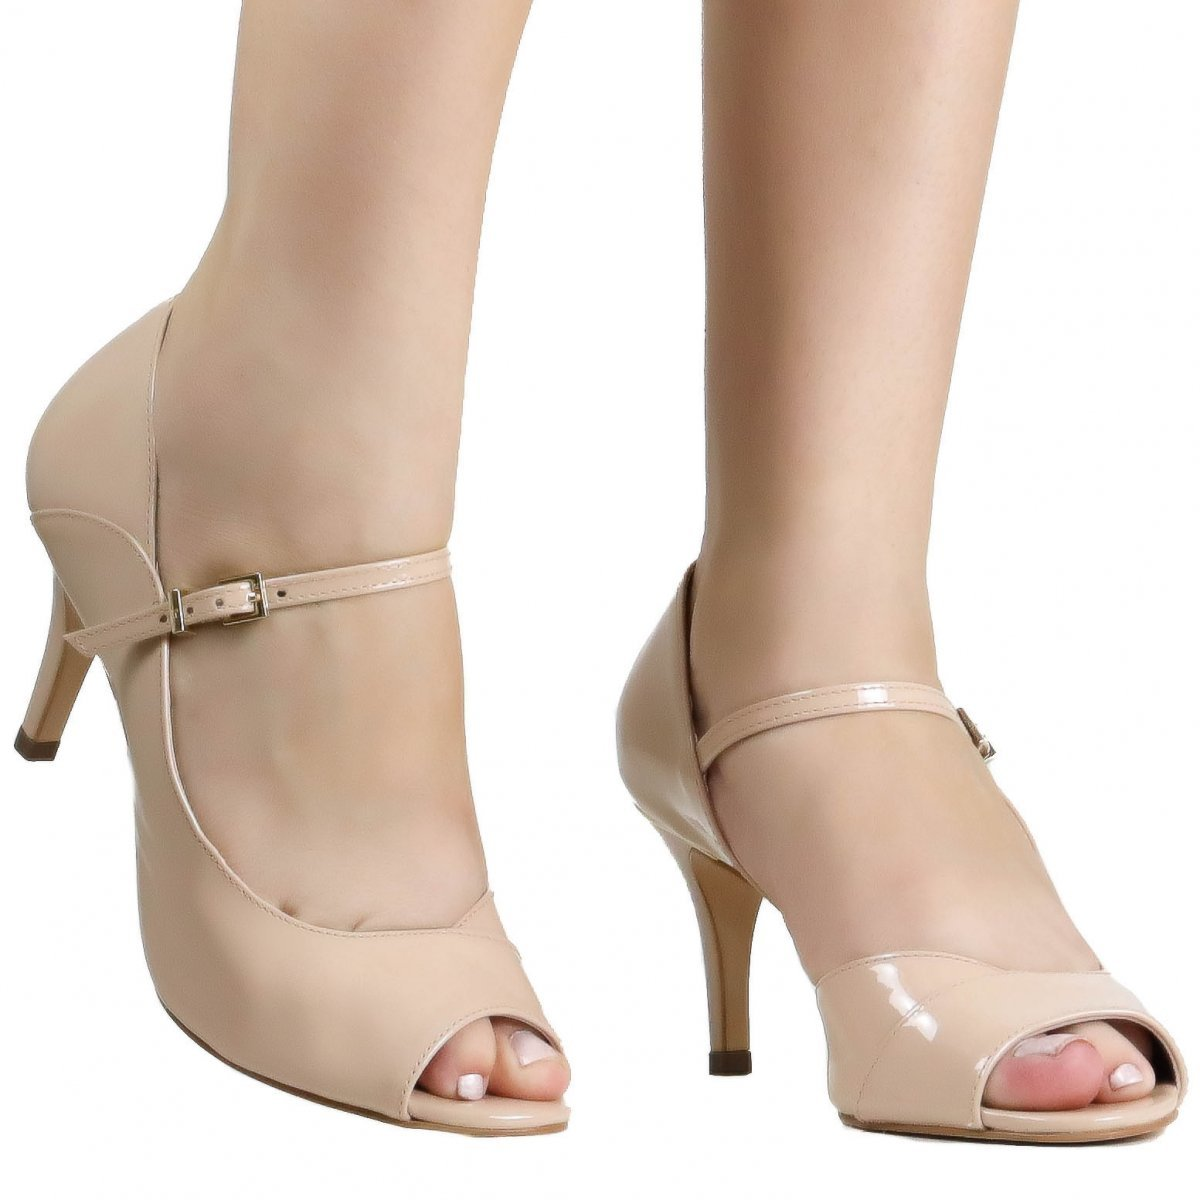 088b98651f Sapato Jorge Bischoff Peep Toe Verniz Croco